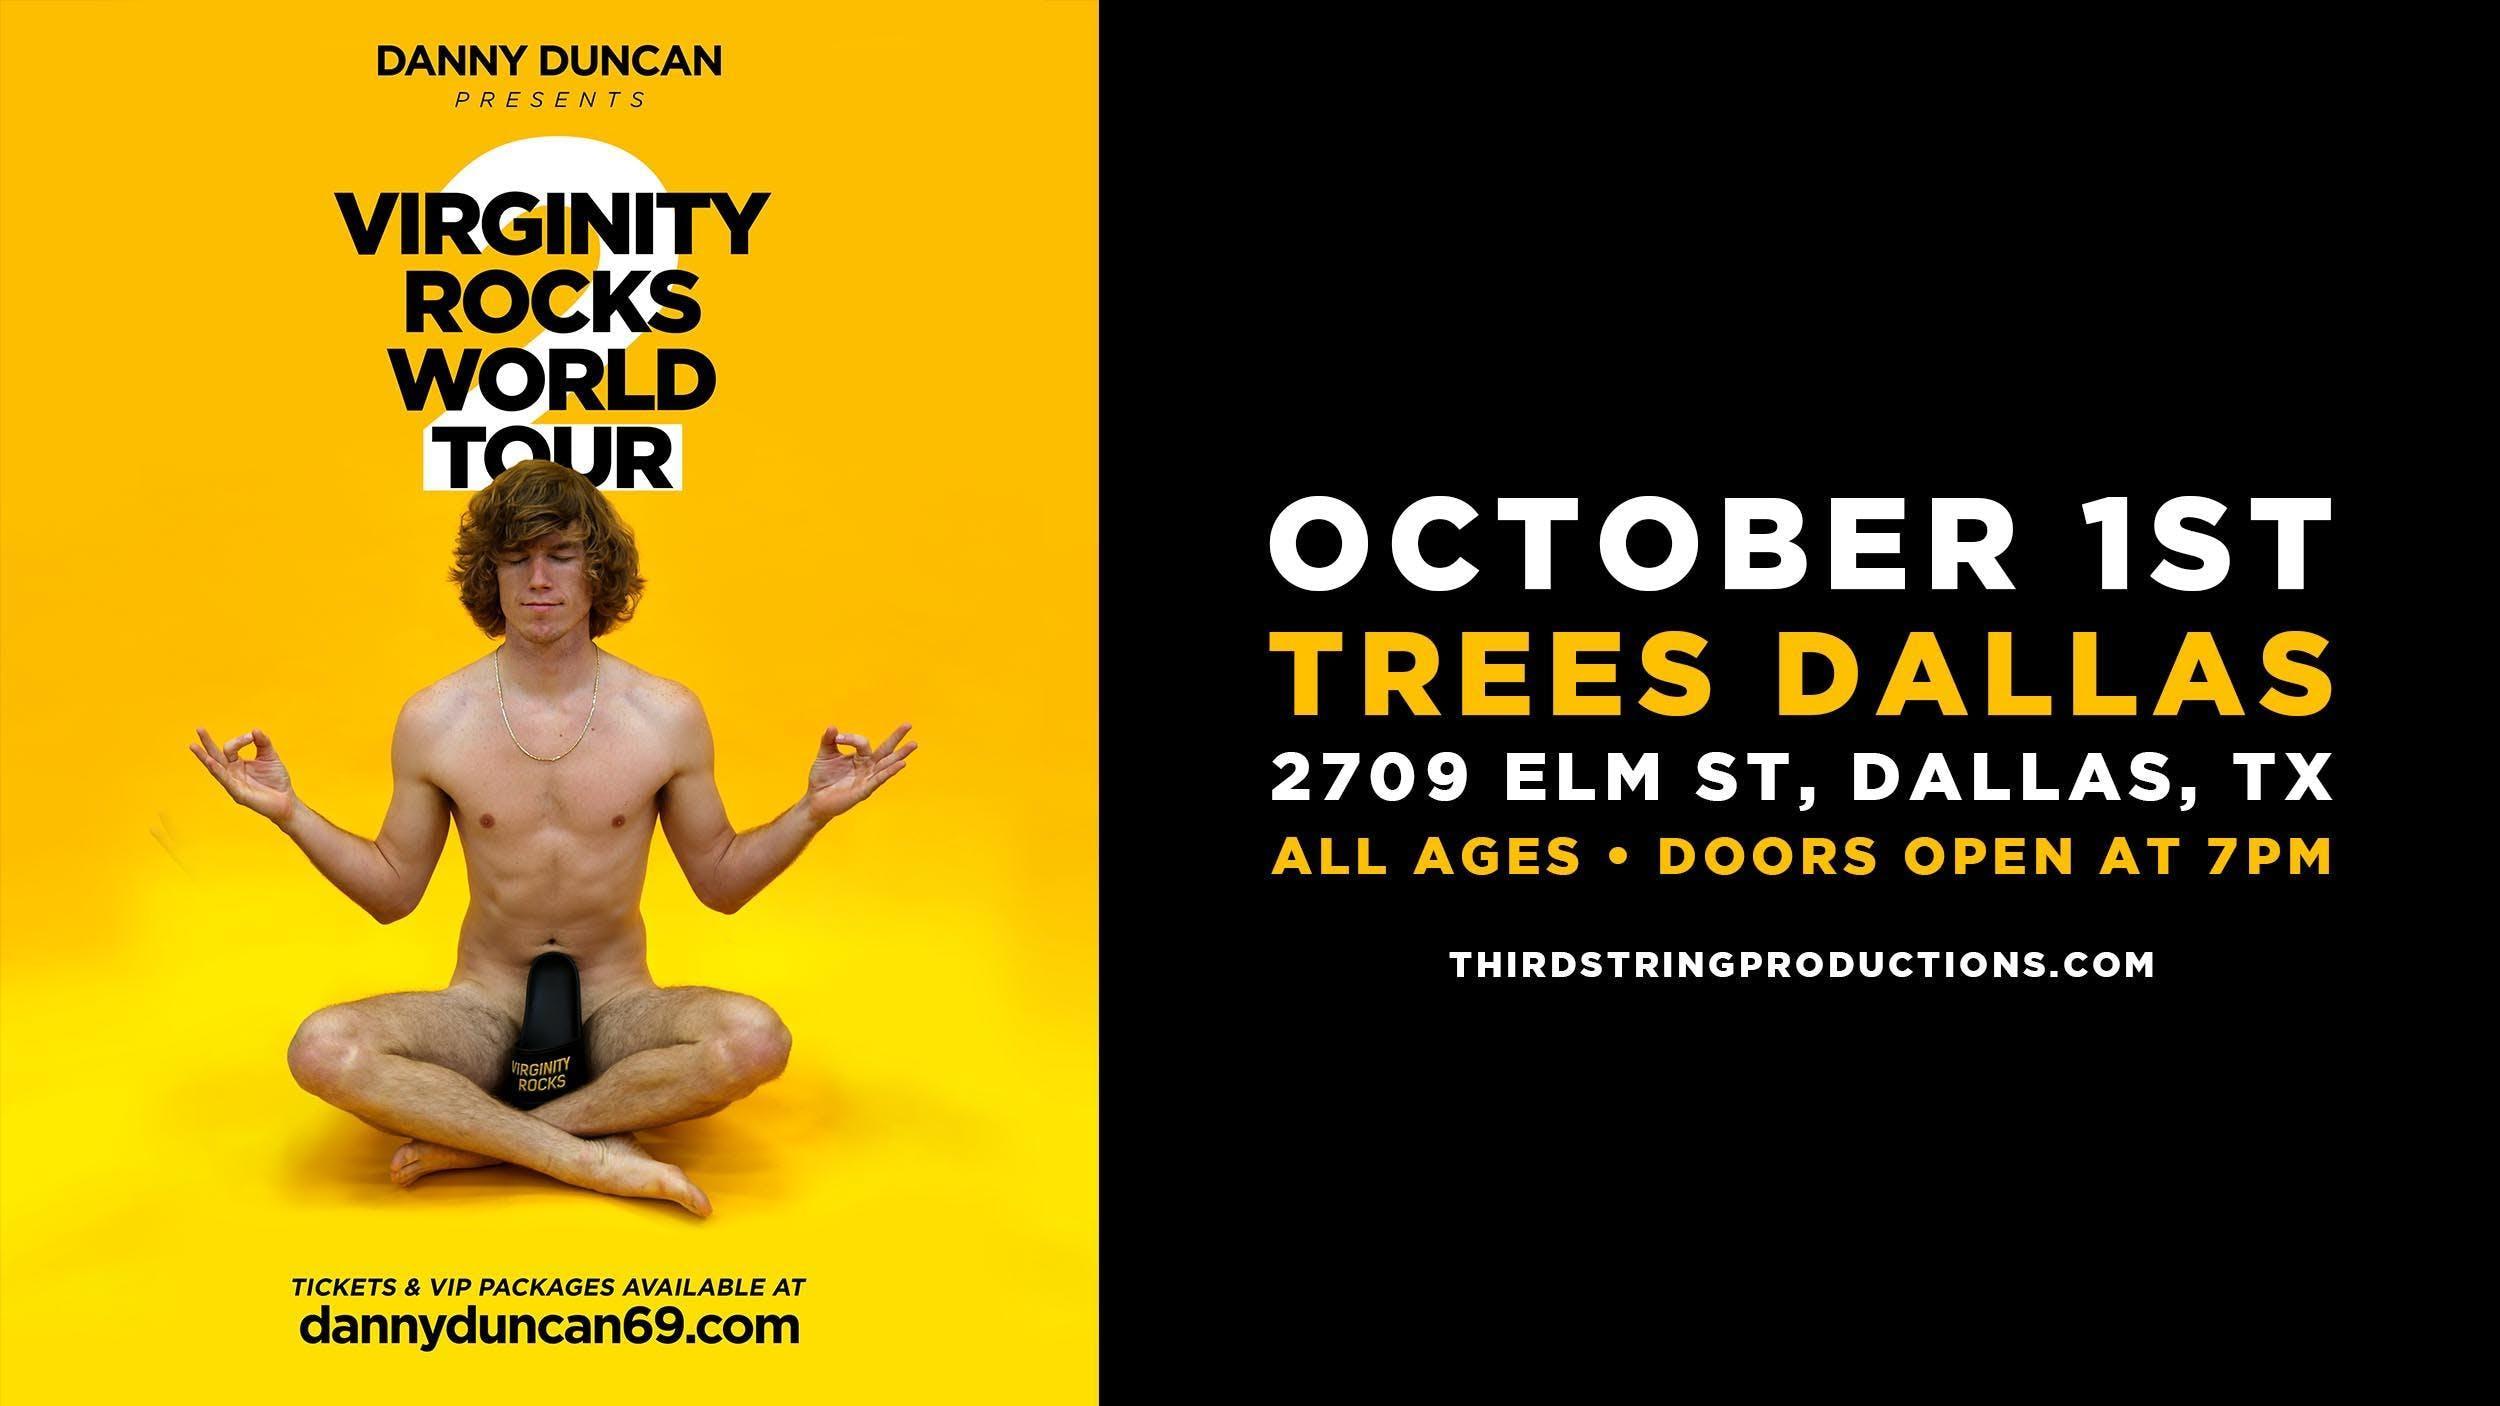 Danny Duncan Virginity Rocks World Tour 2 Tickets Trees